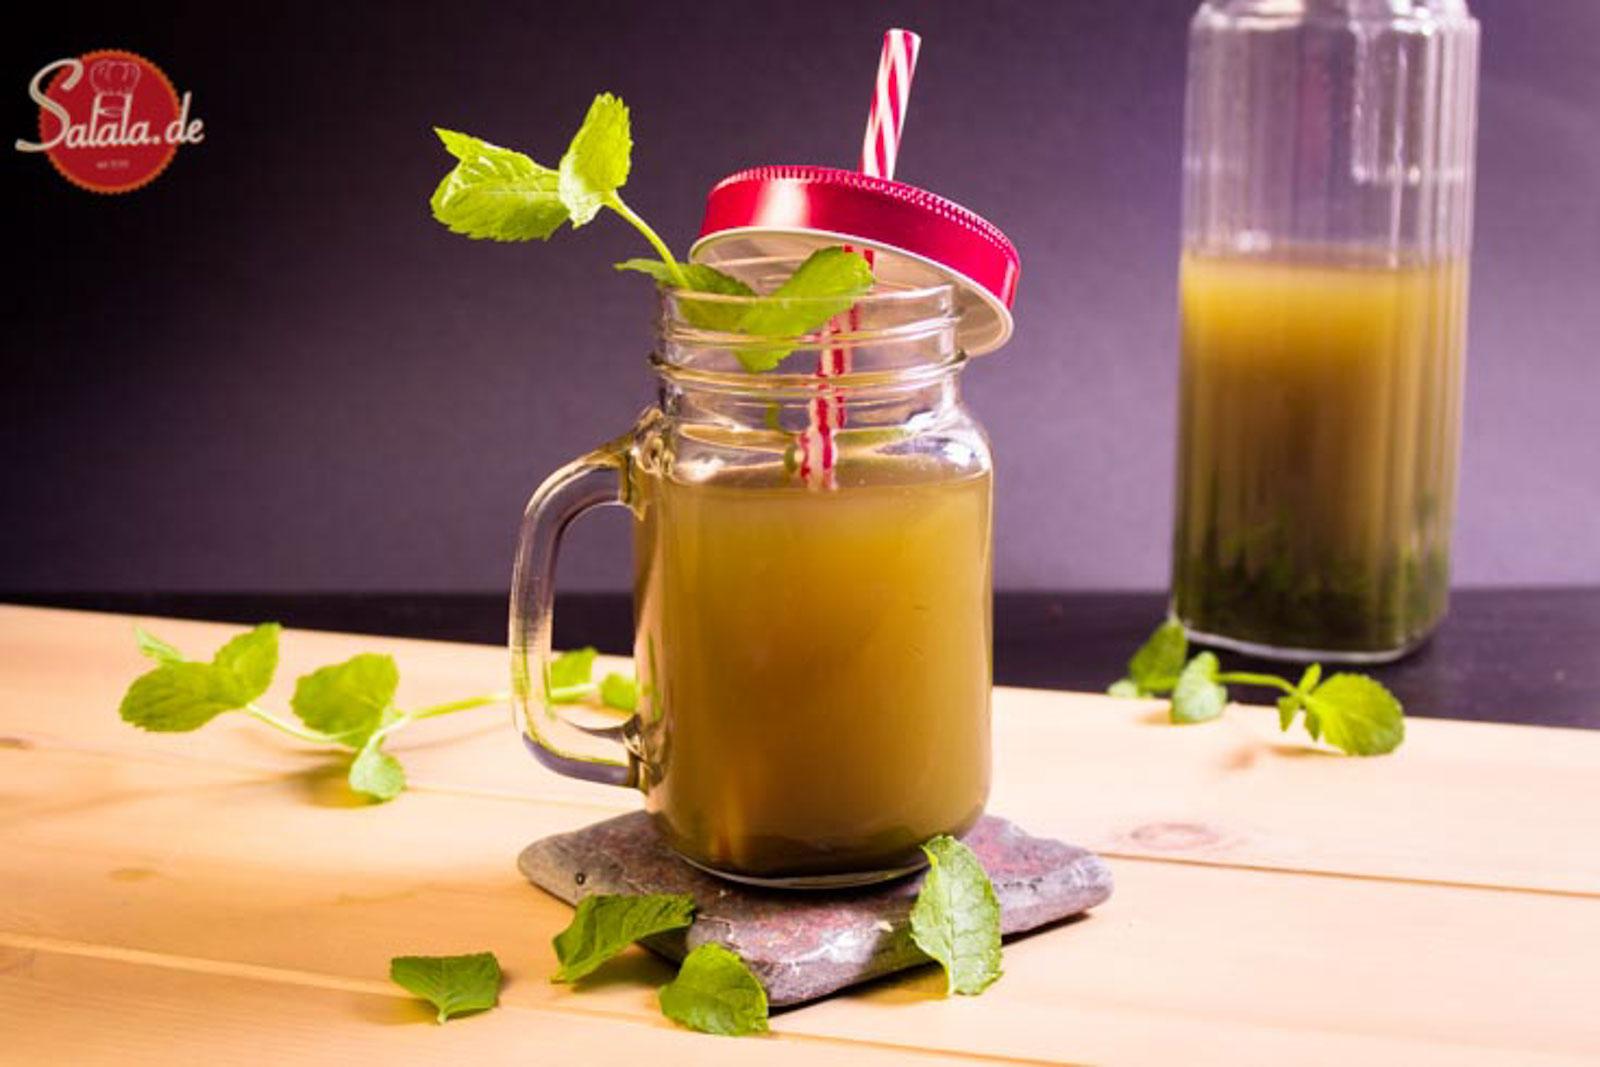 Minzgetränk Game of Thrones Low Carb Limonade Rezept mit Minze